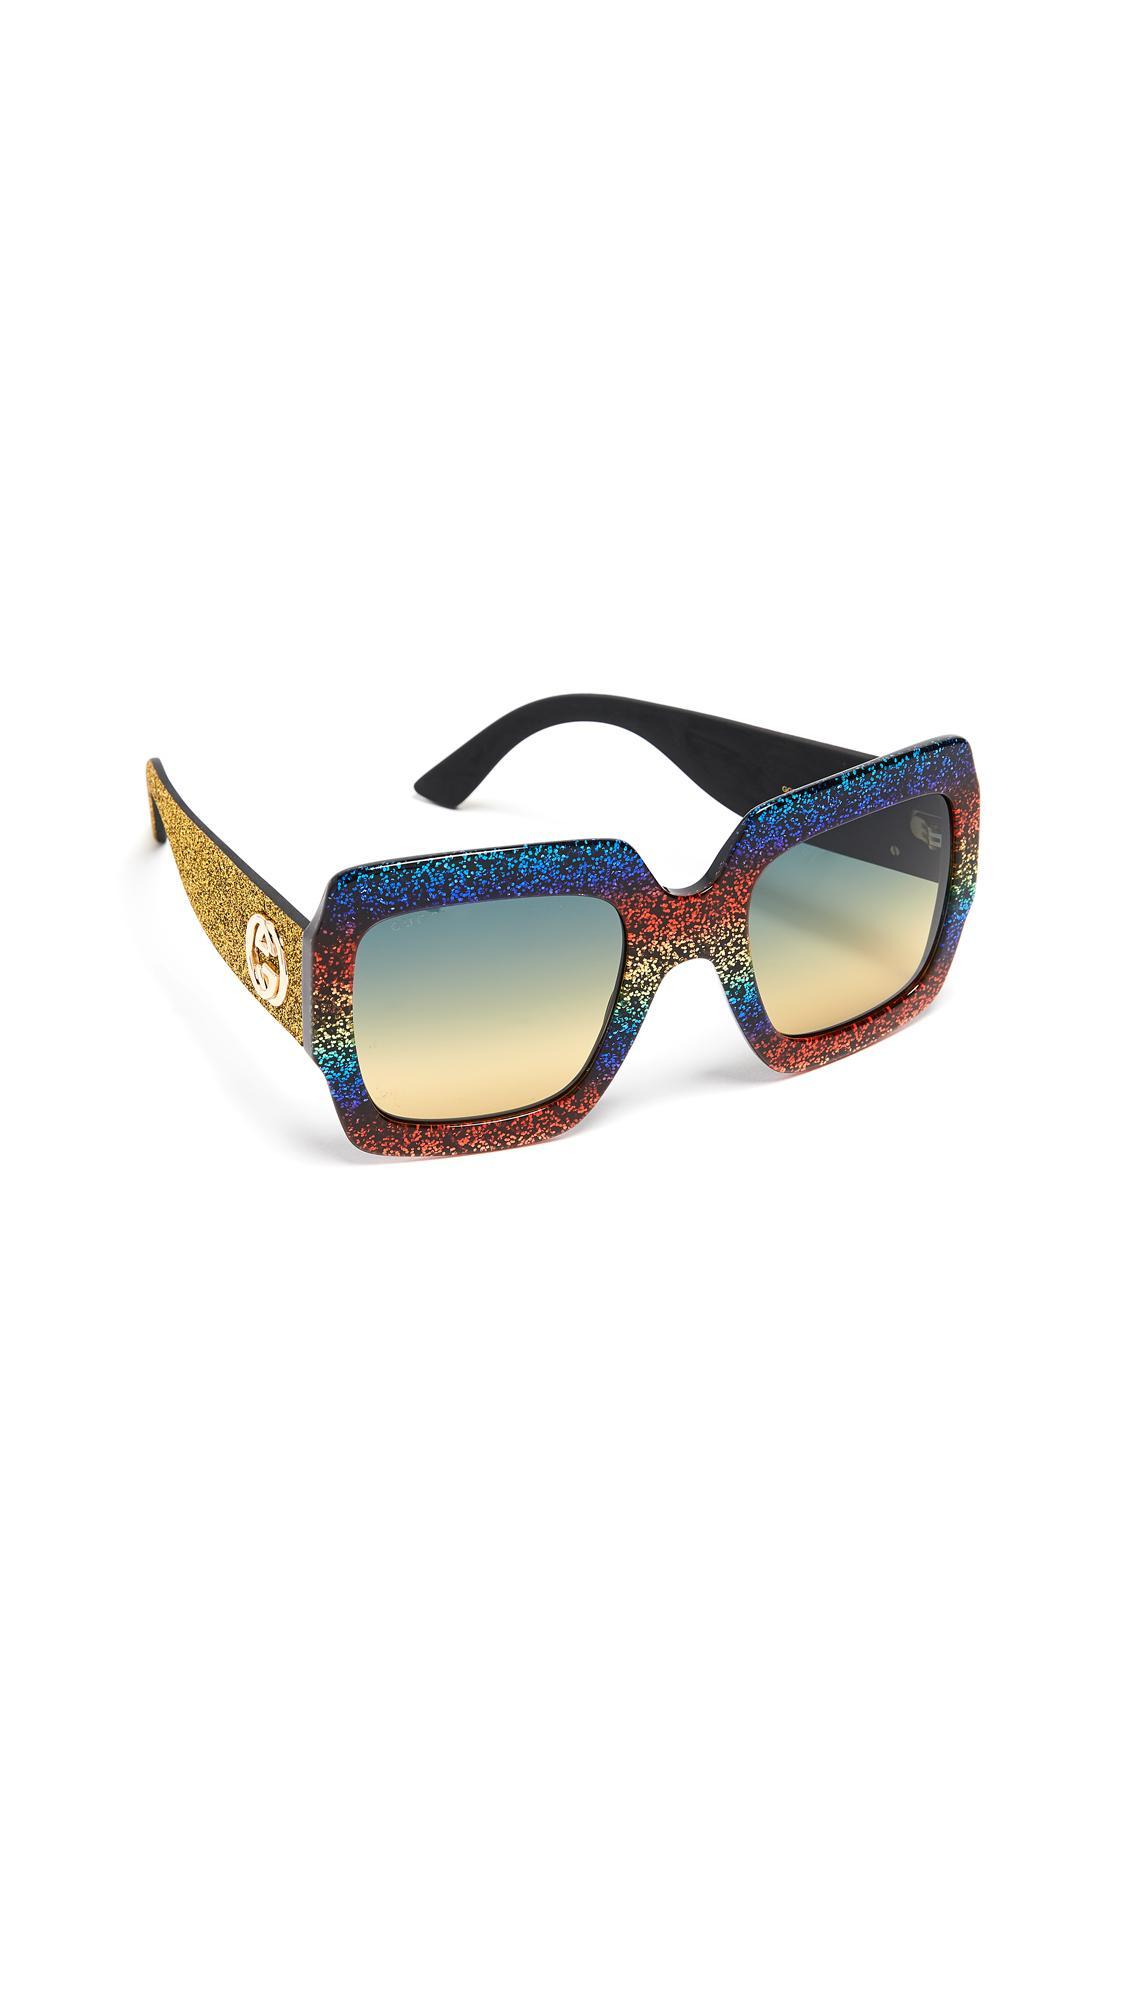 Gucci Pop Glitter Iconic Oversized Square Sunglasses In Glitter Rainbow Gold/Grey